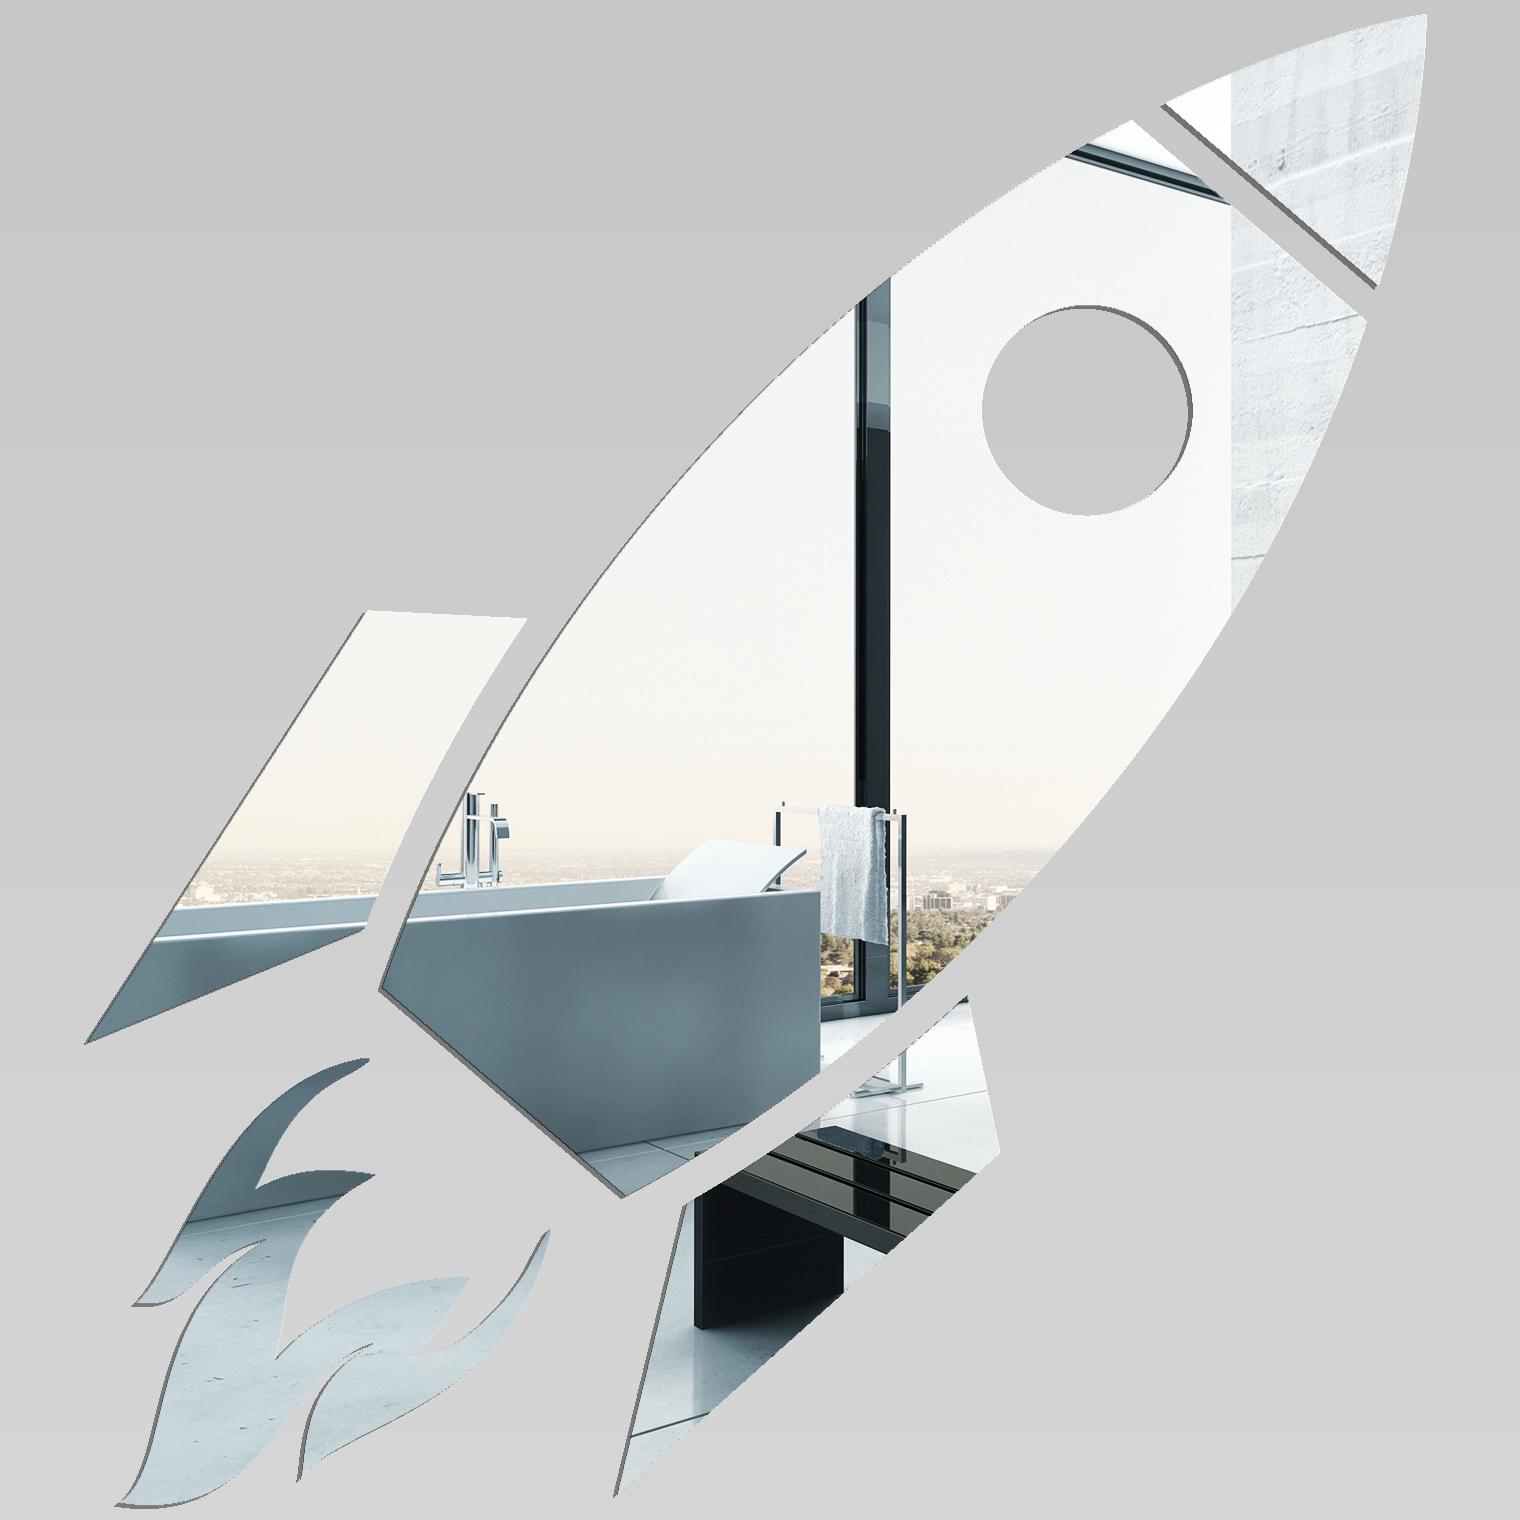 Miroir plexiglass acrylique fus e spaciale pas cher for Miroir acrylique